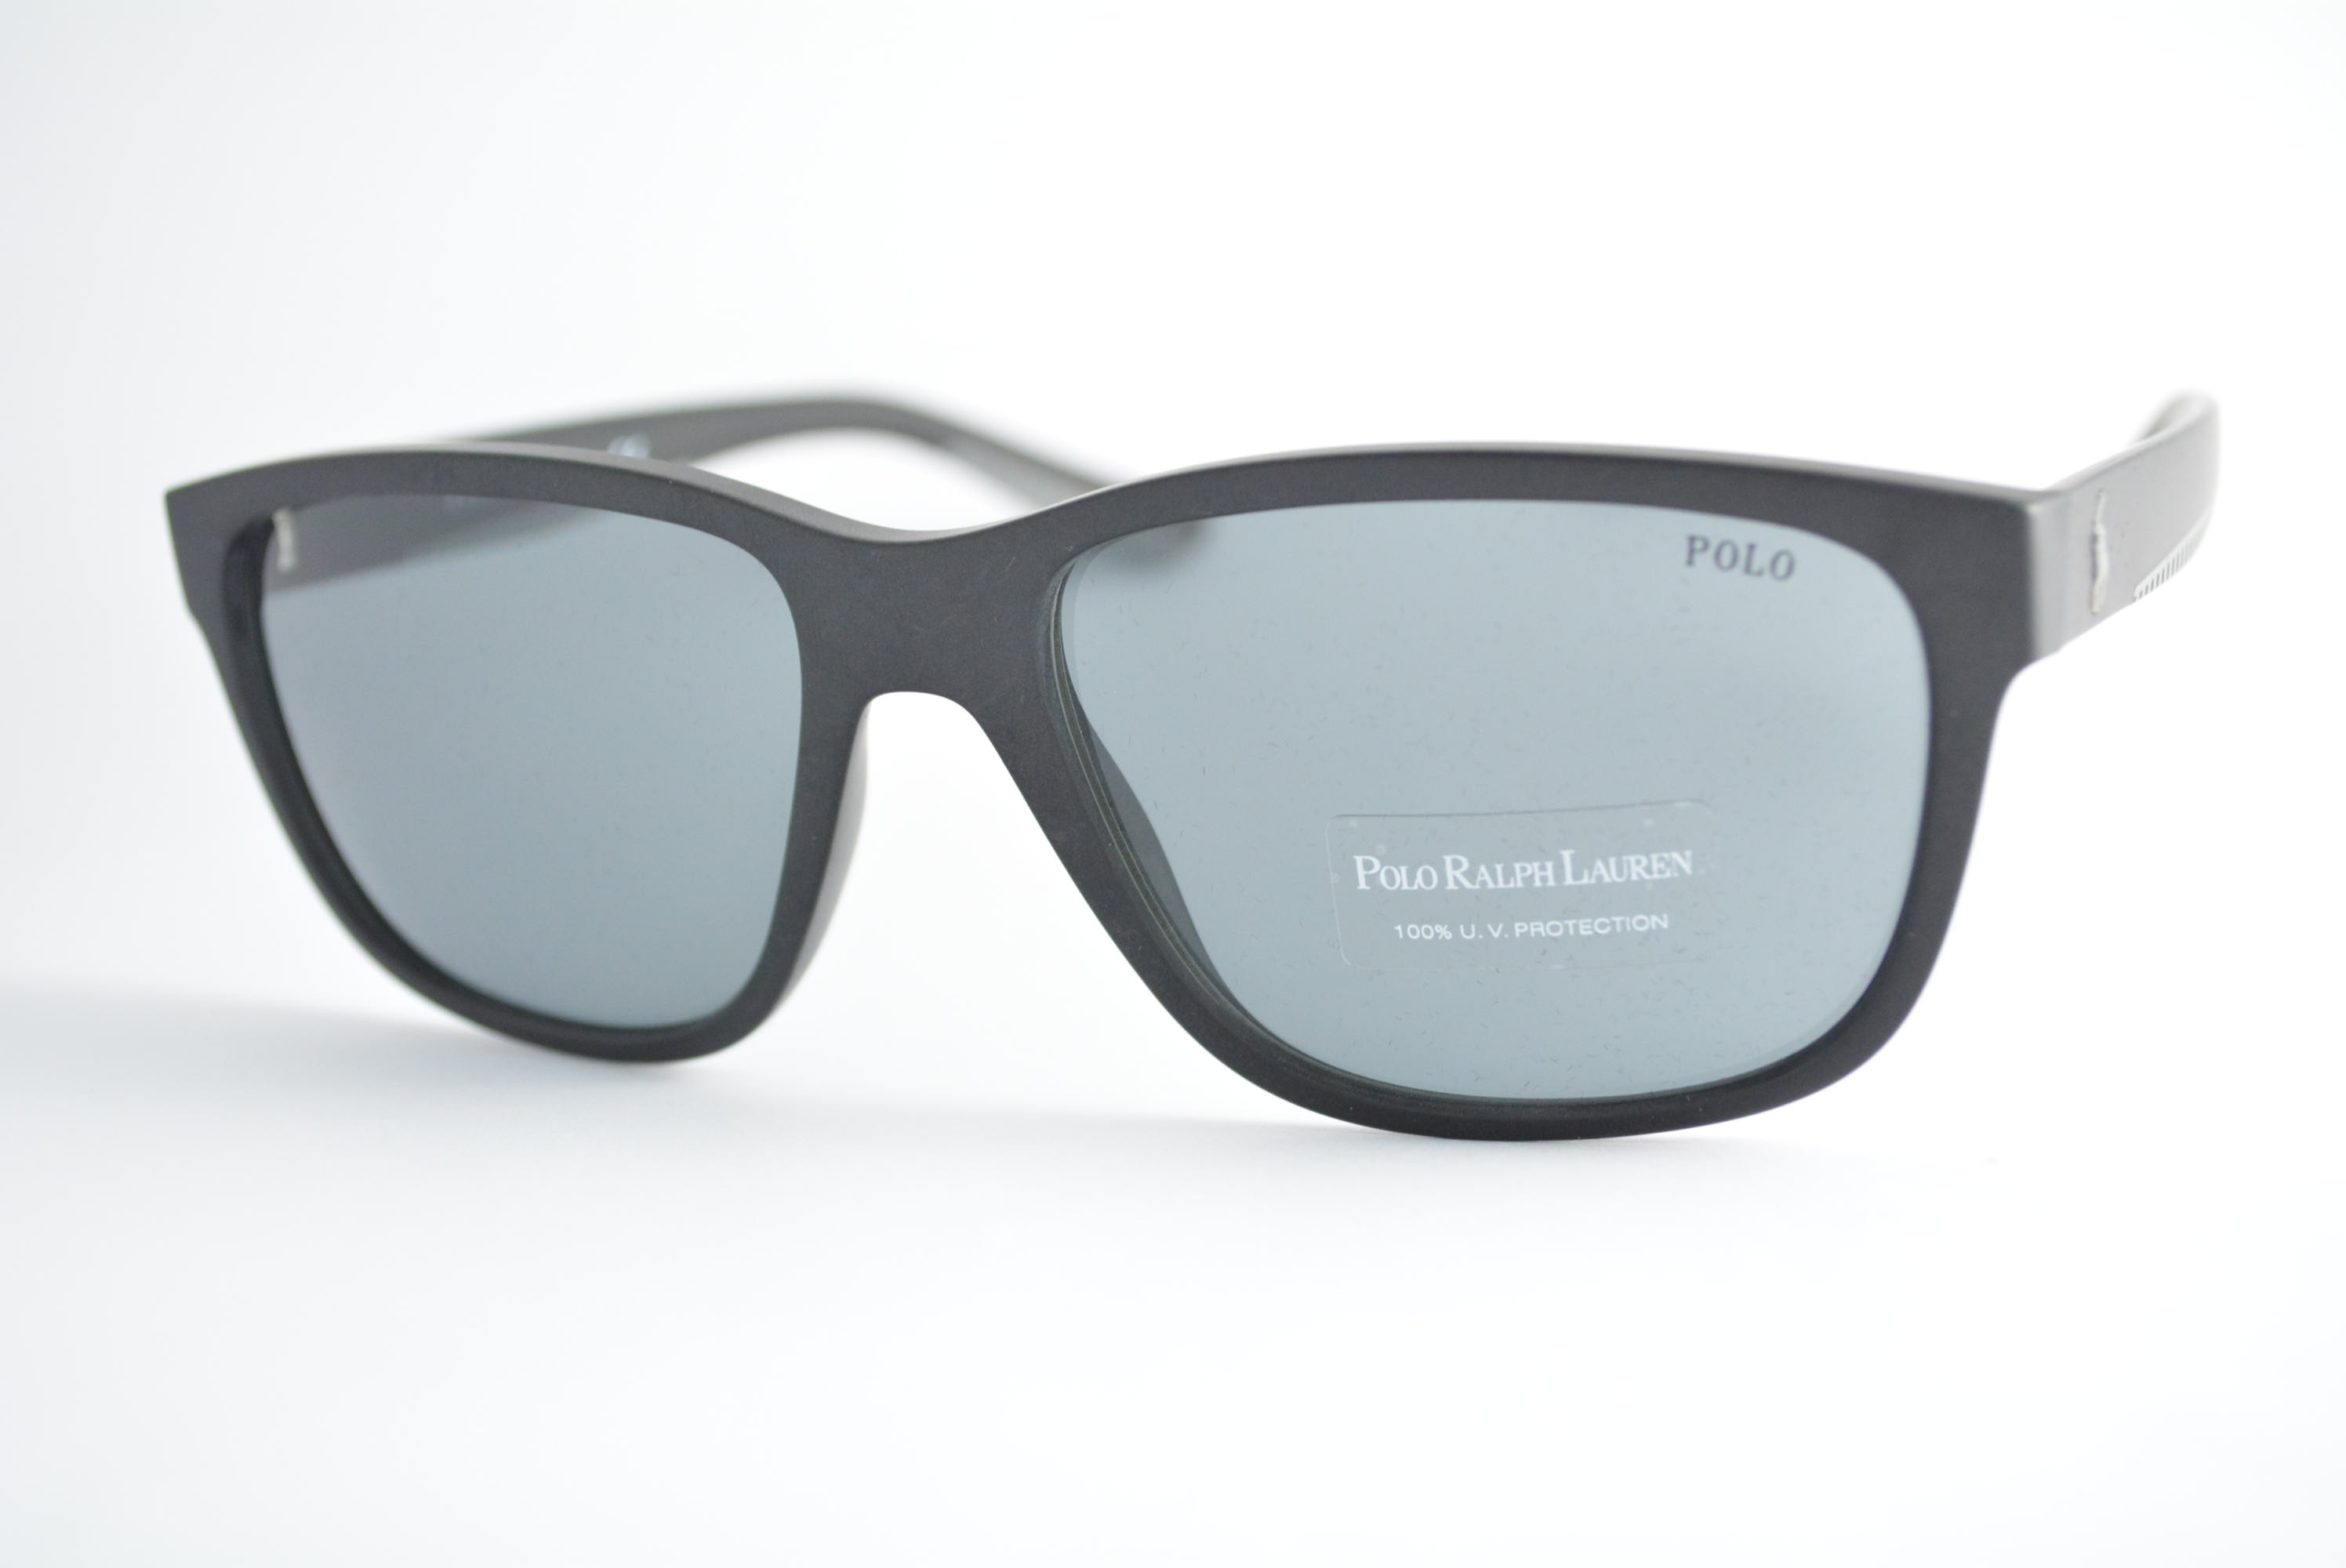 0b1b550c7 óculos de sol Polo Ralph Lauren mod ph4142 5284/87 Ótica Cardoso